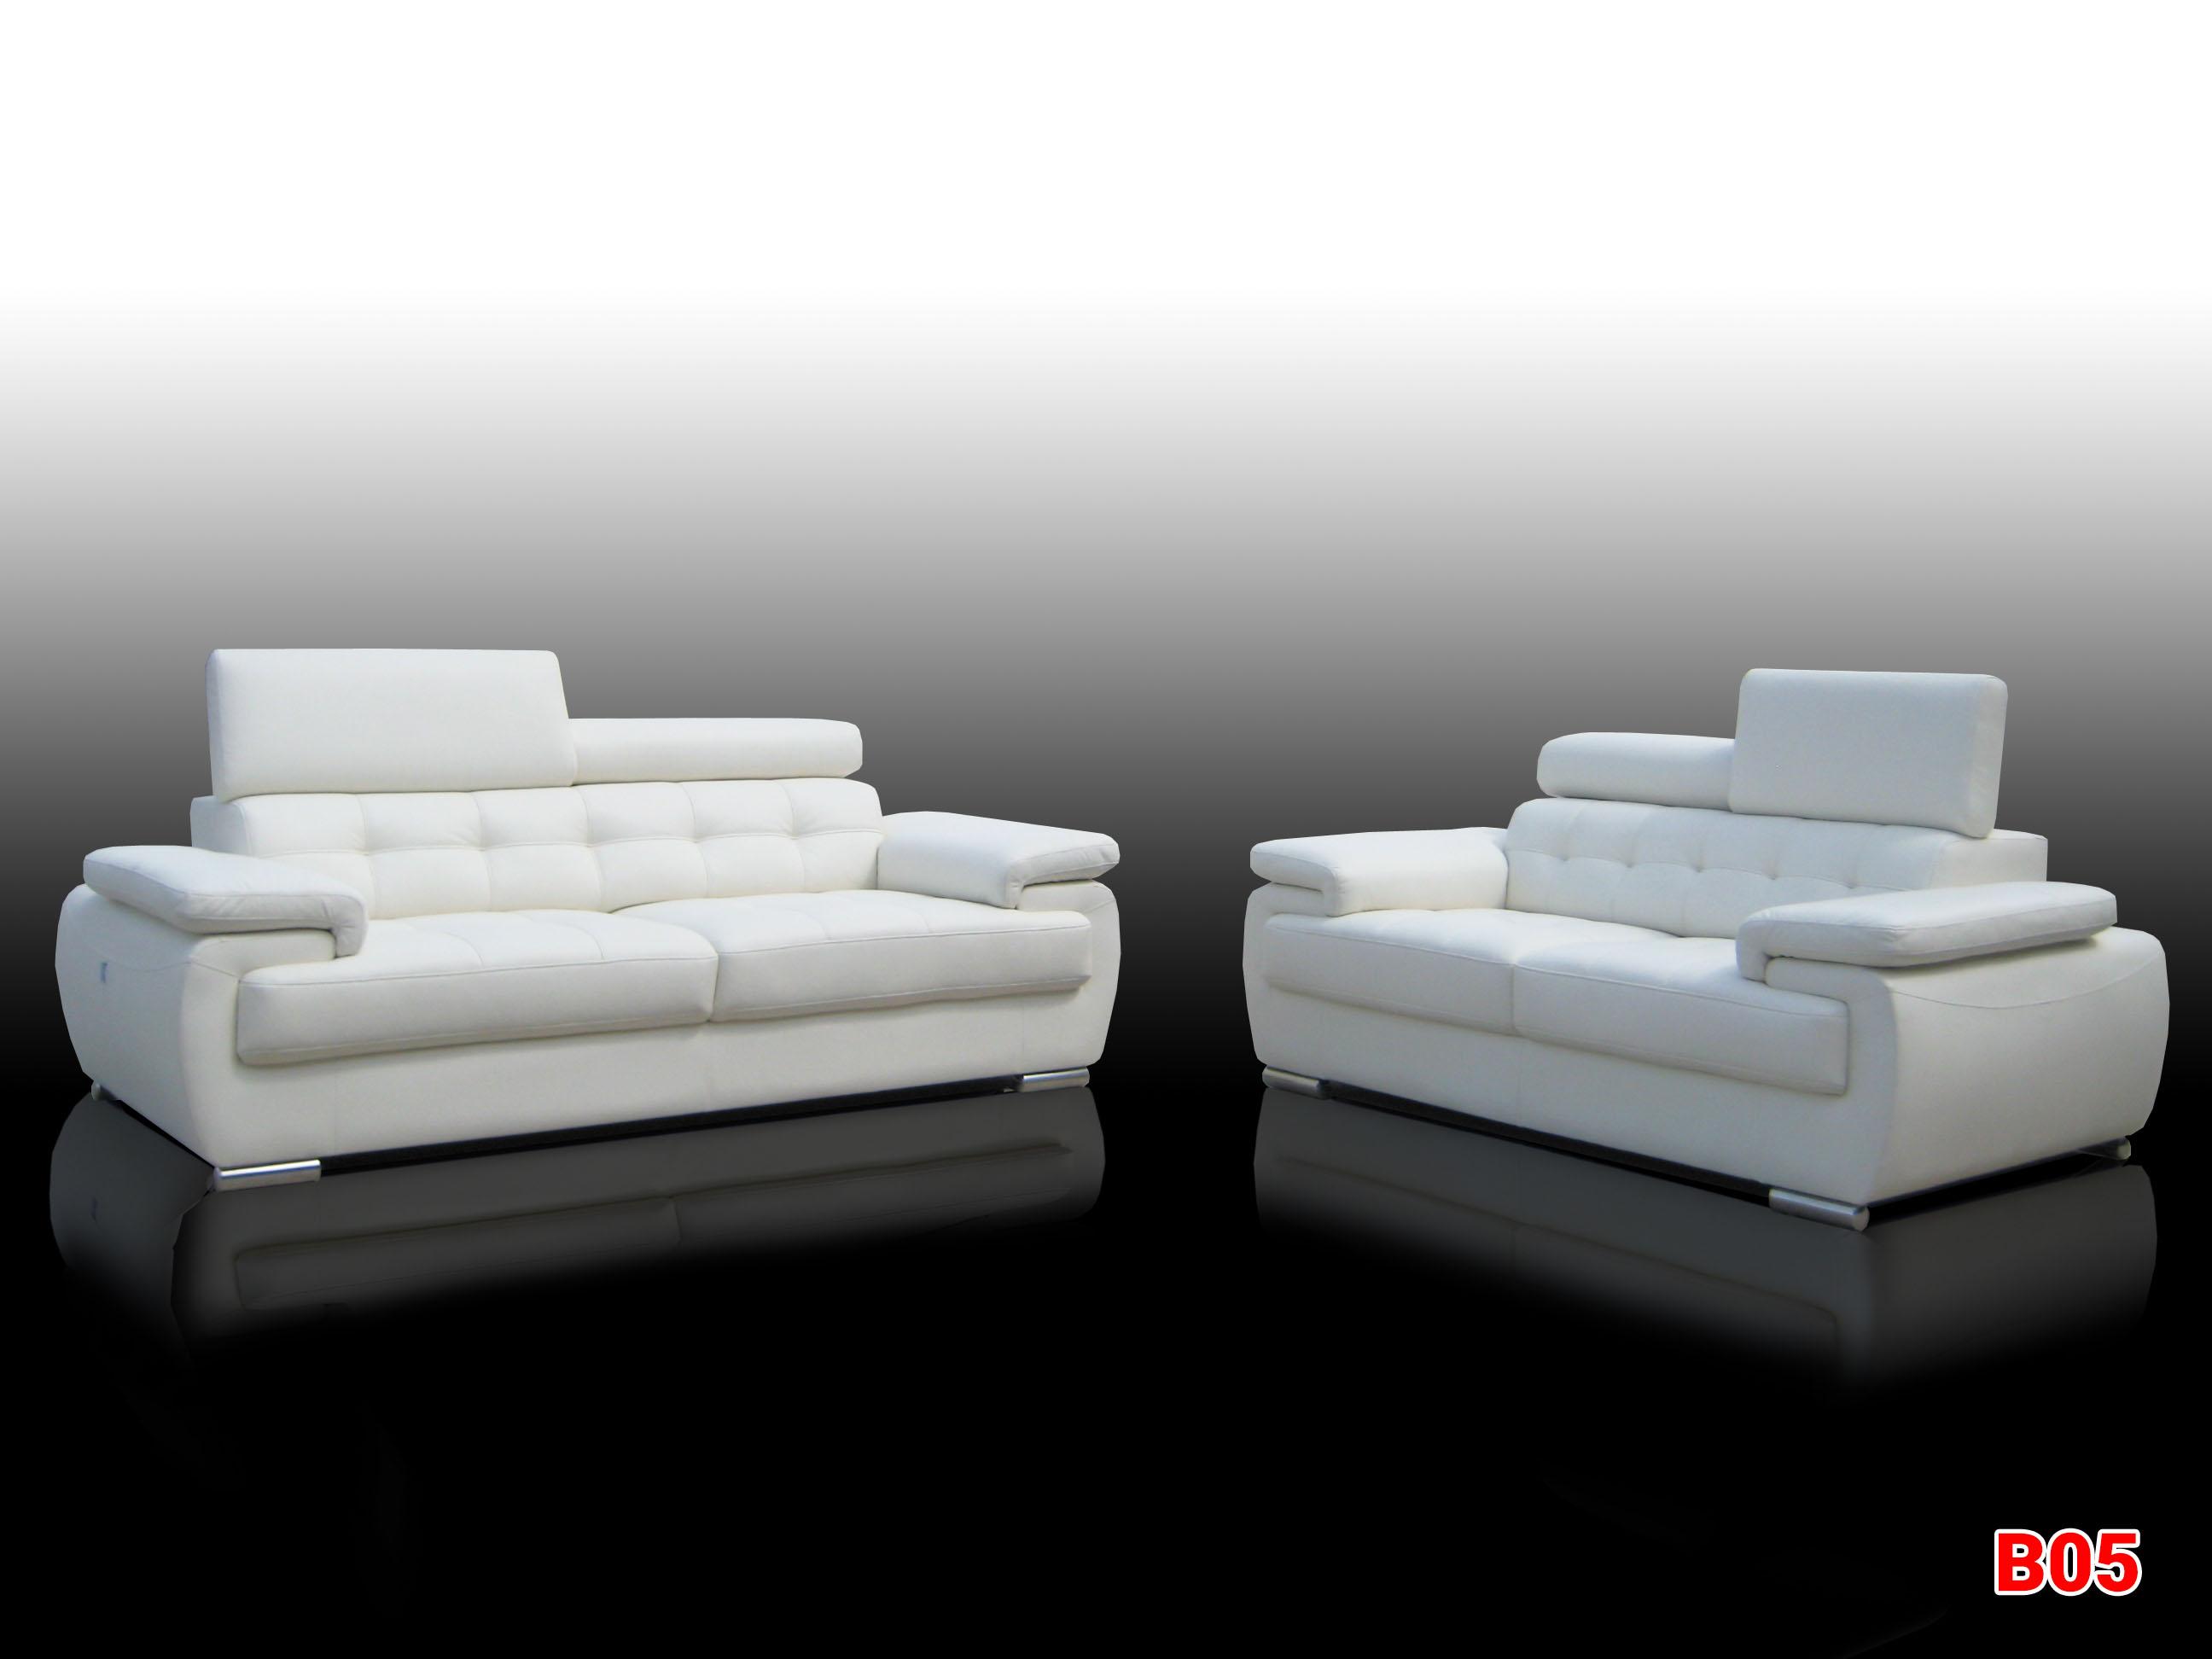 Ghế sofa da phòng khách B05